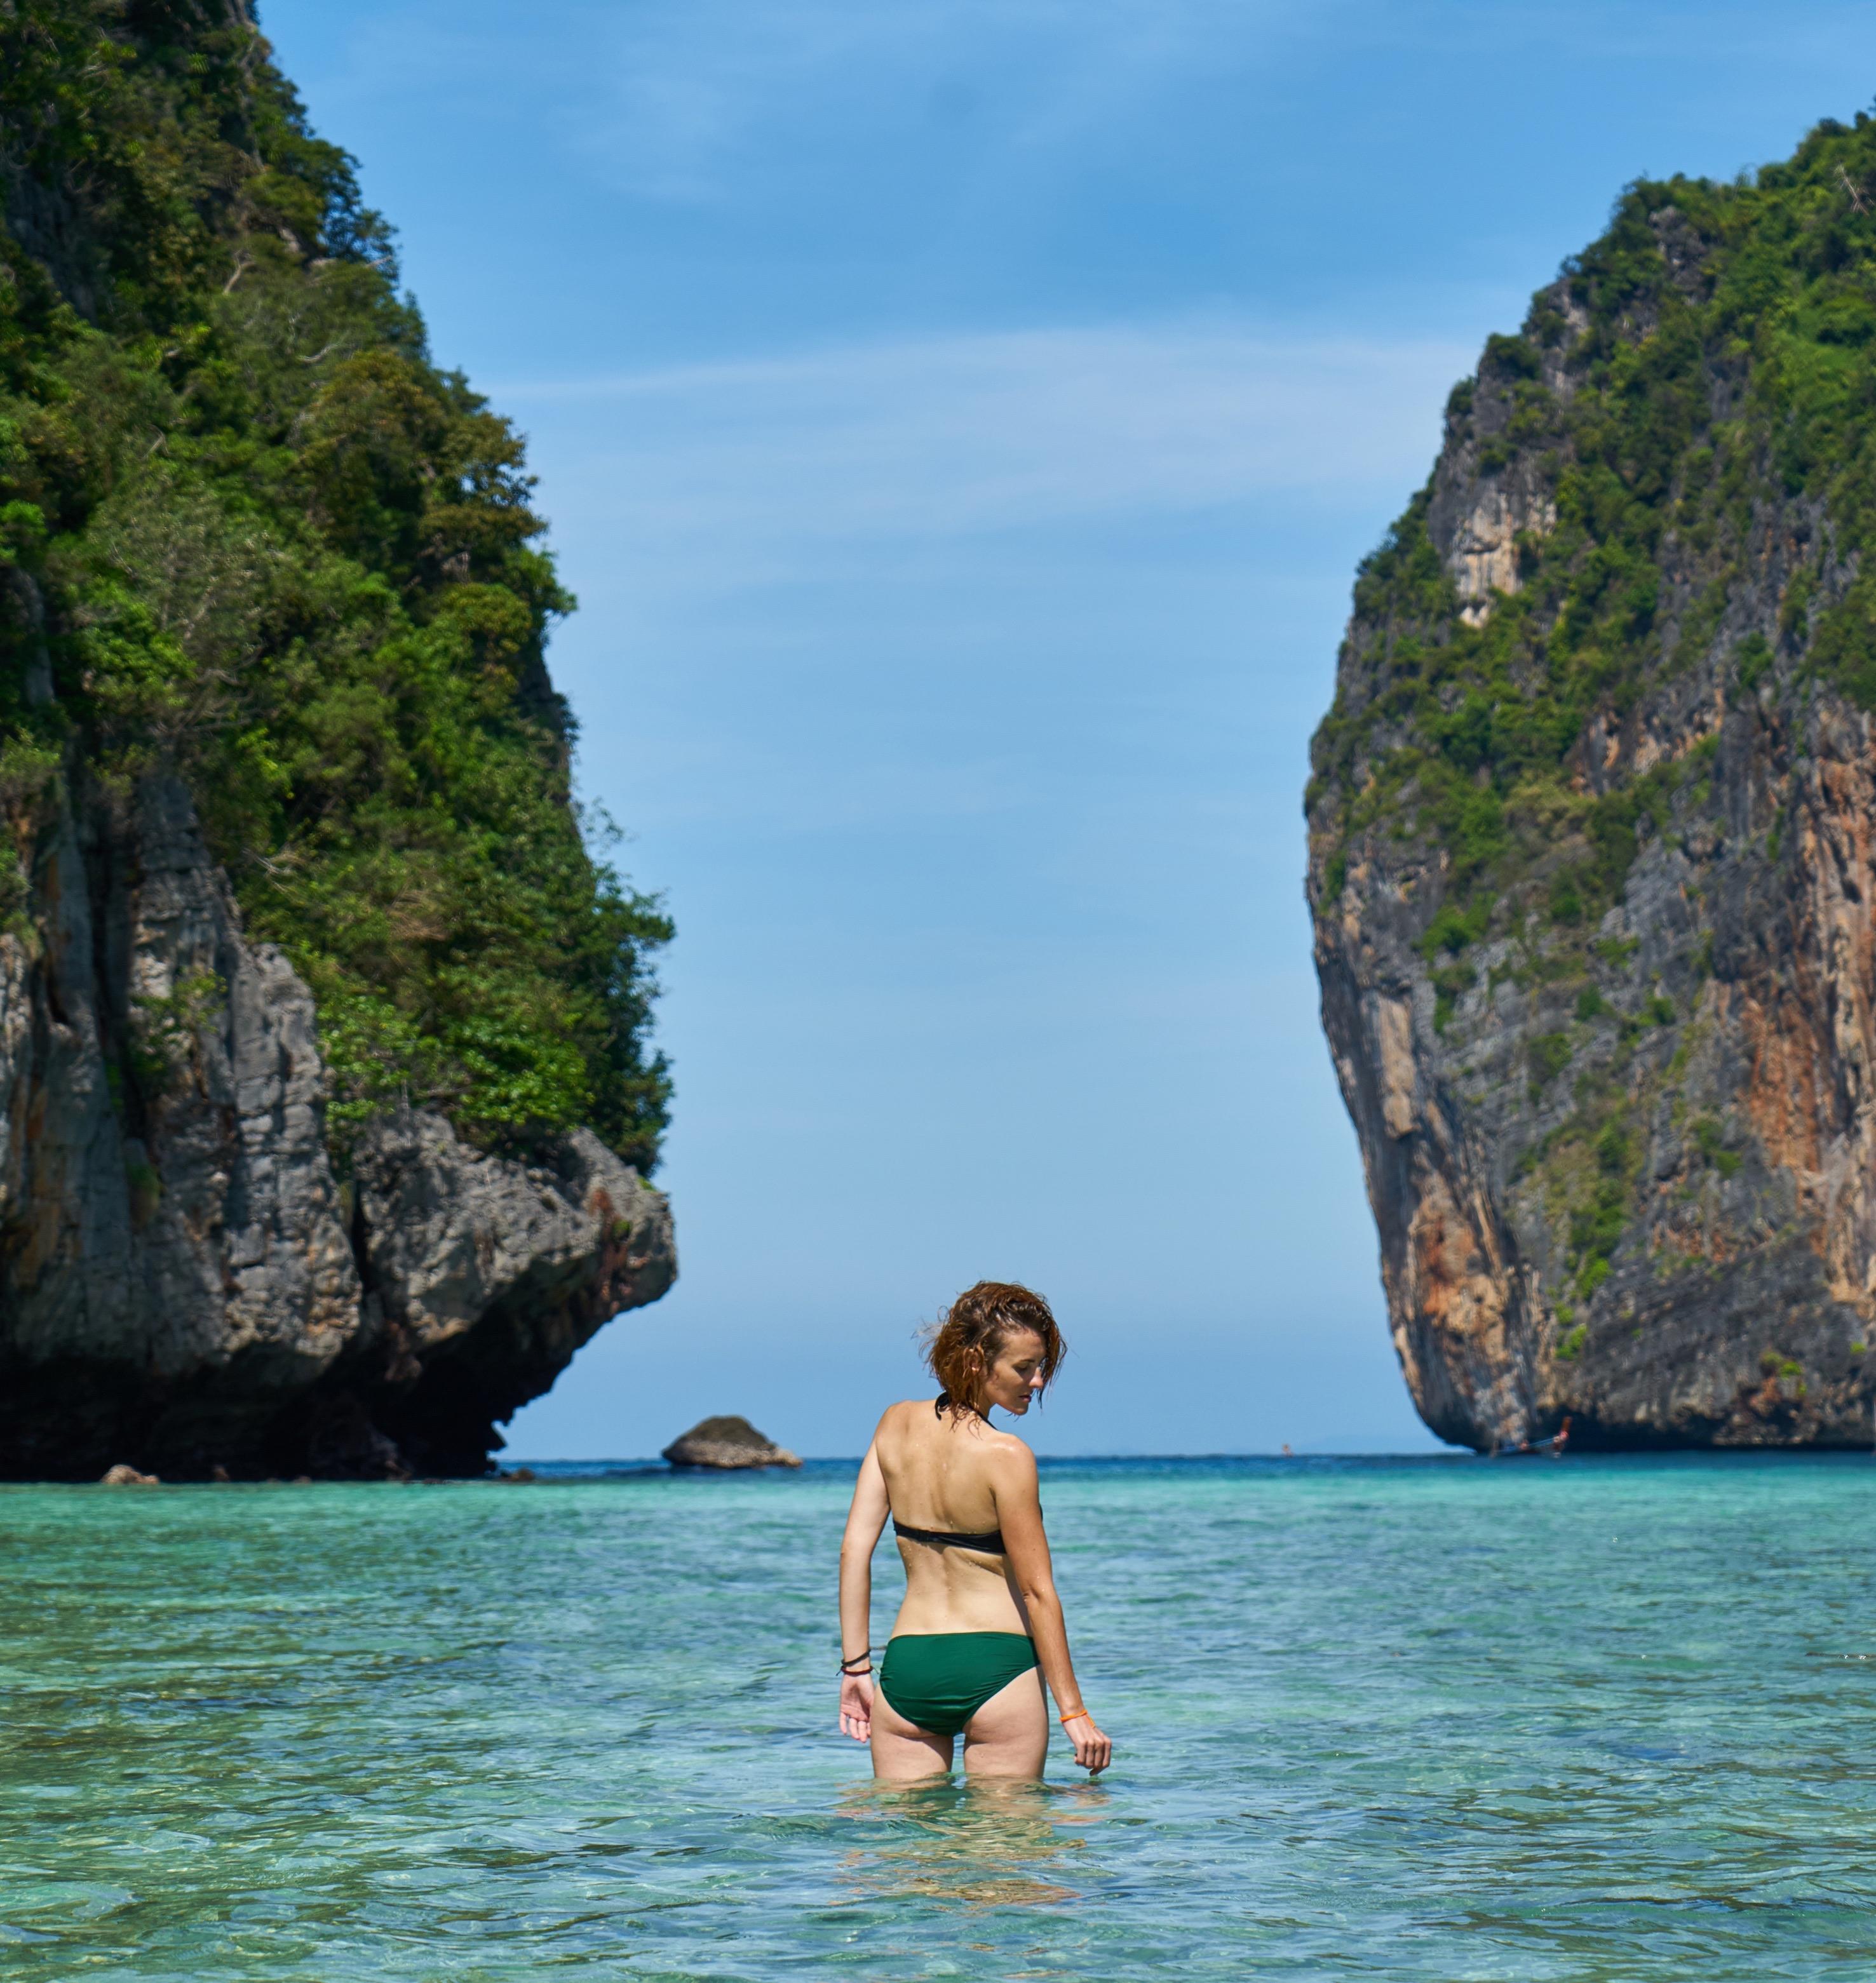 Maya Bay From Leonardo Dicaprio S The Beach To Close Due Too Many Tourists